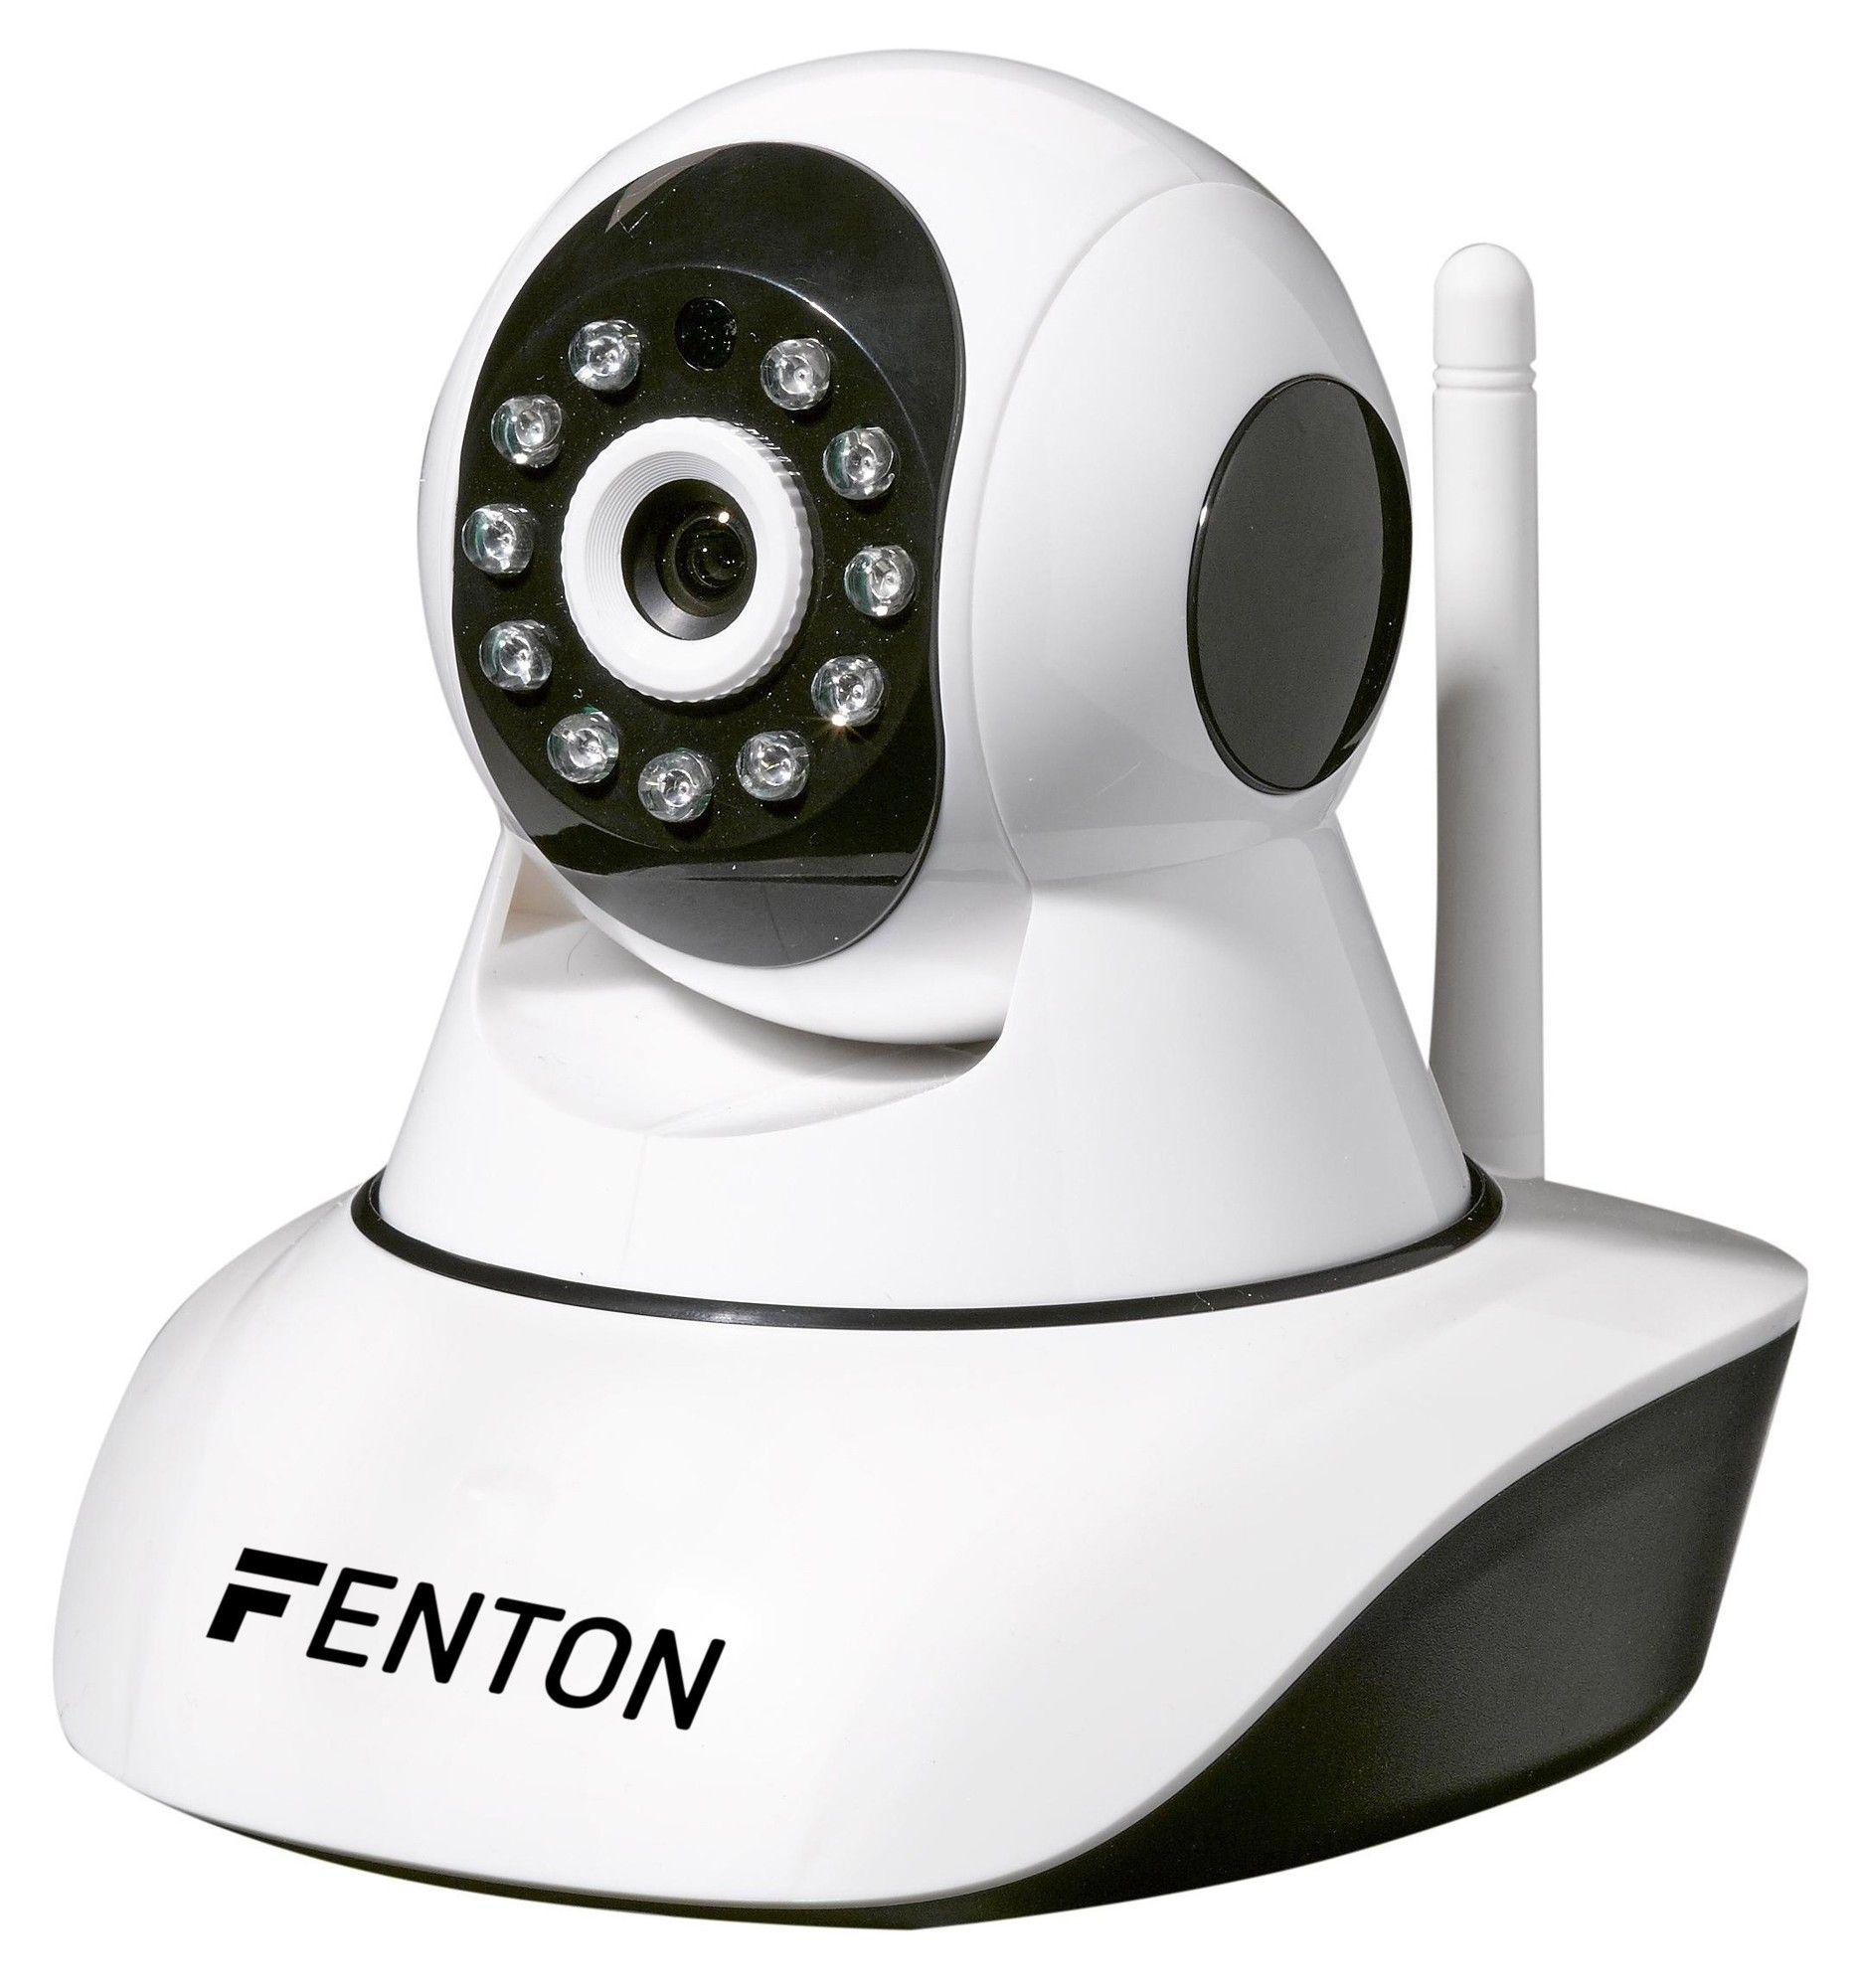 Afbeelding van Fenton HD IP camera met IR LED\'s en beweging pan/tilt...